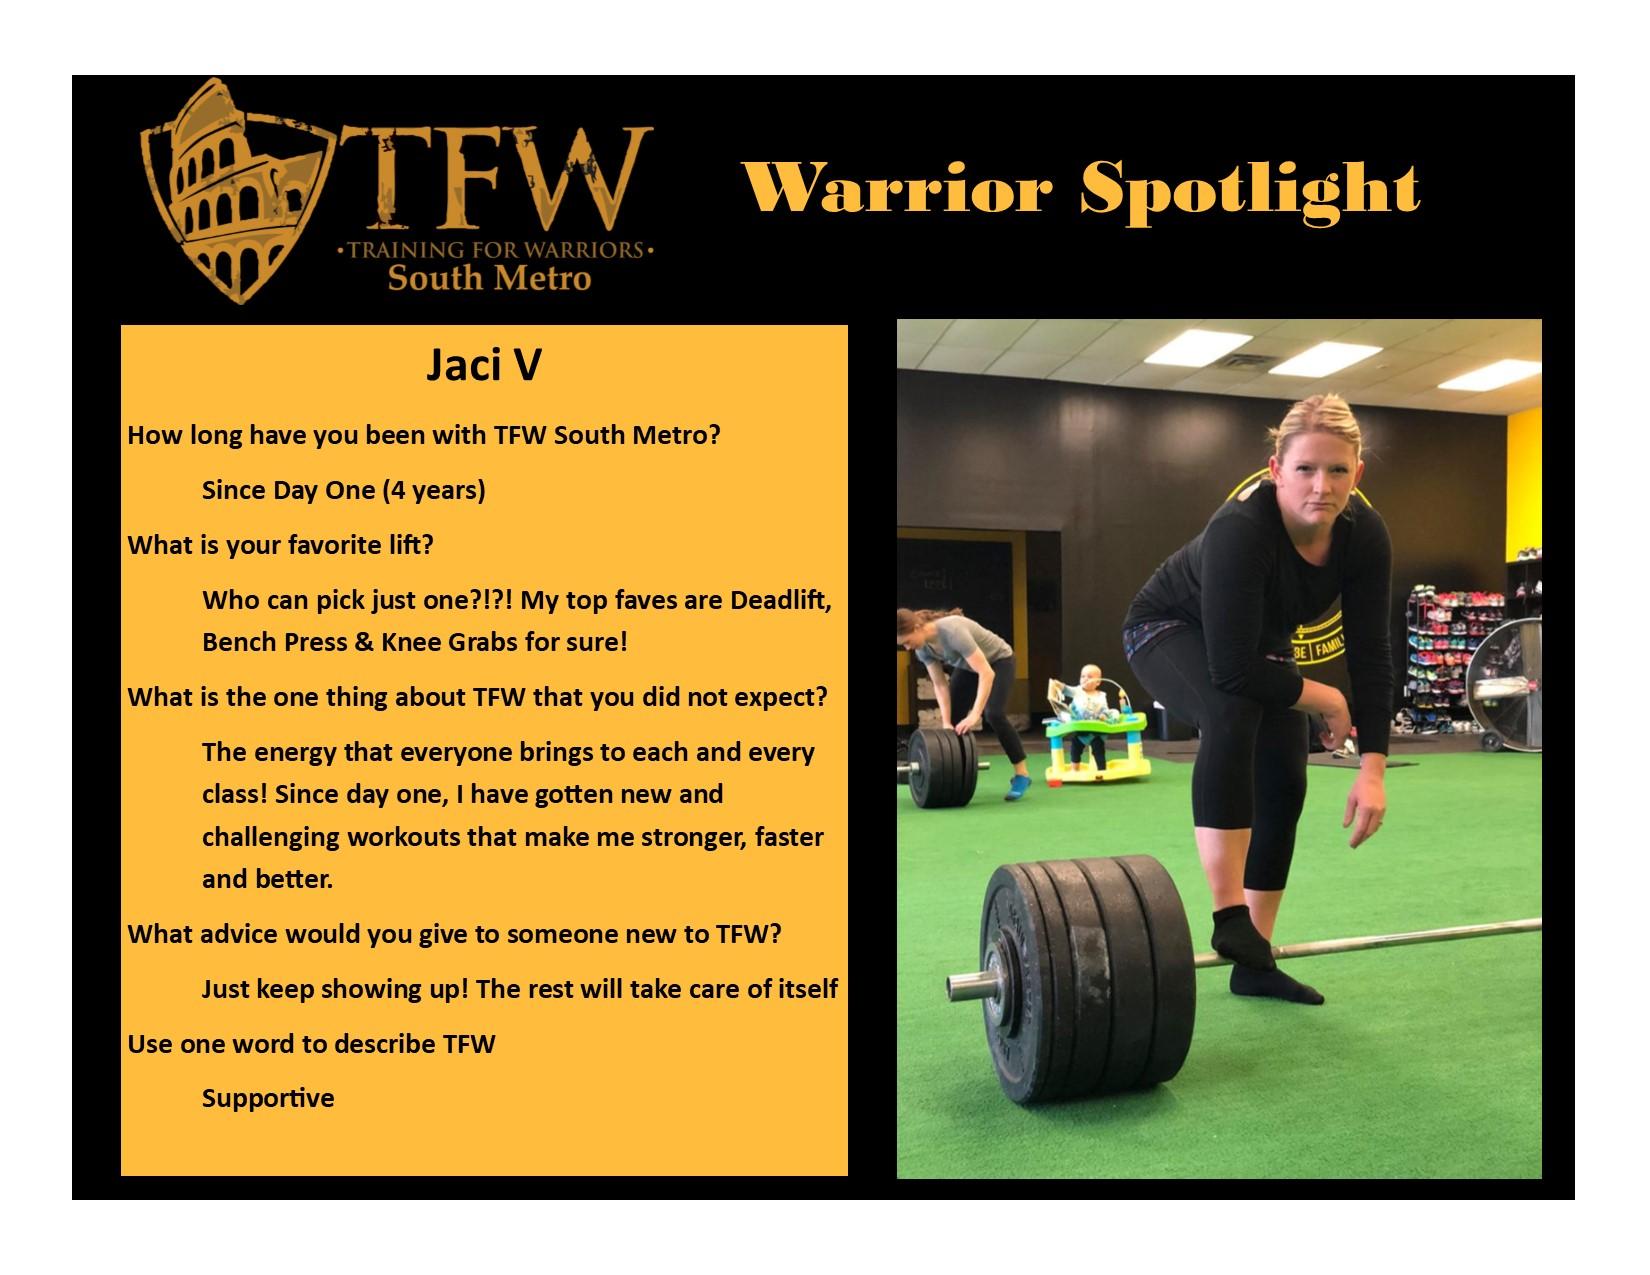 TFW South Metro Warrior, Jaci